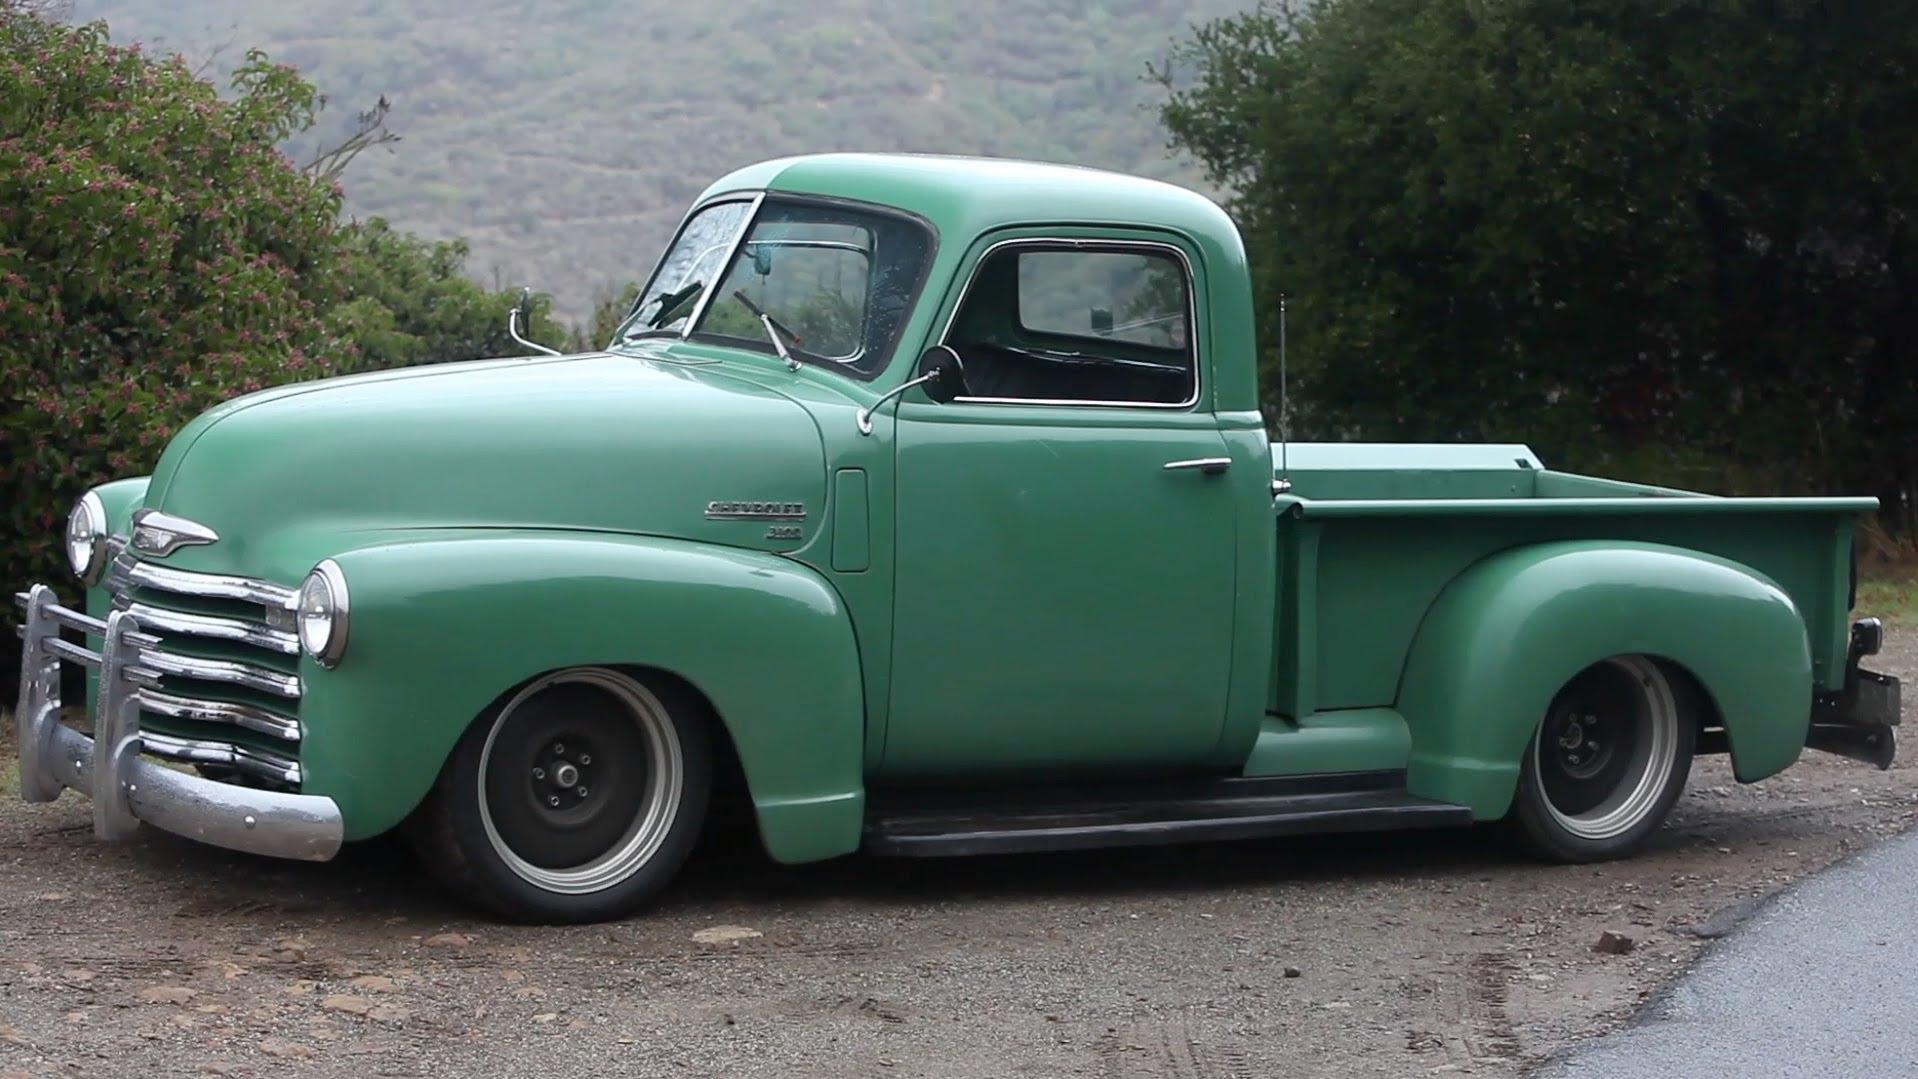 1950s chevy truck